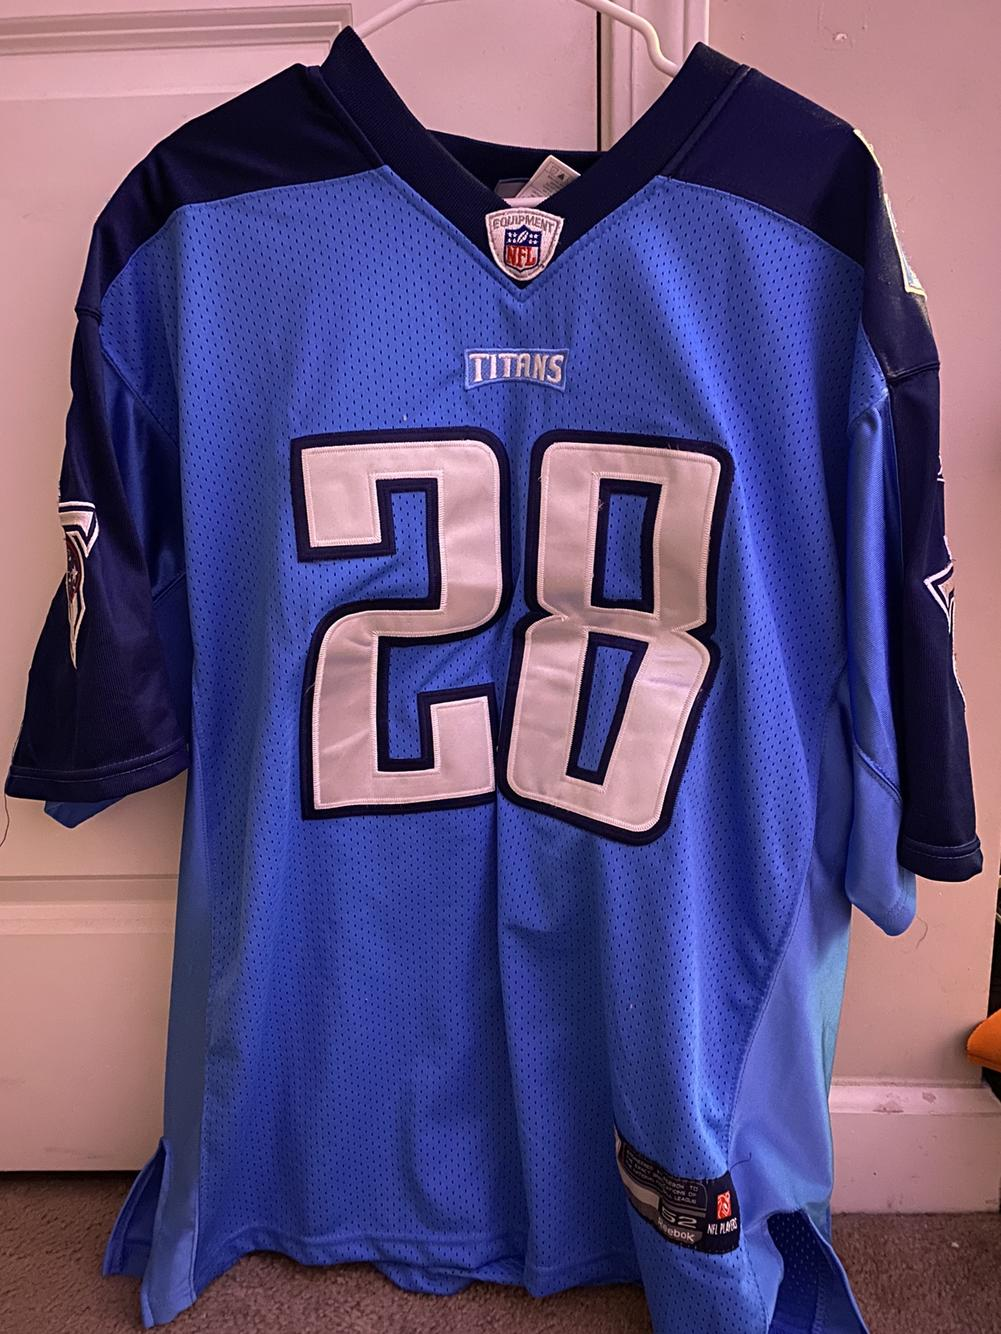 Chris Johnson Titans Jersey